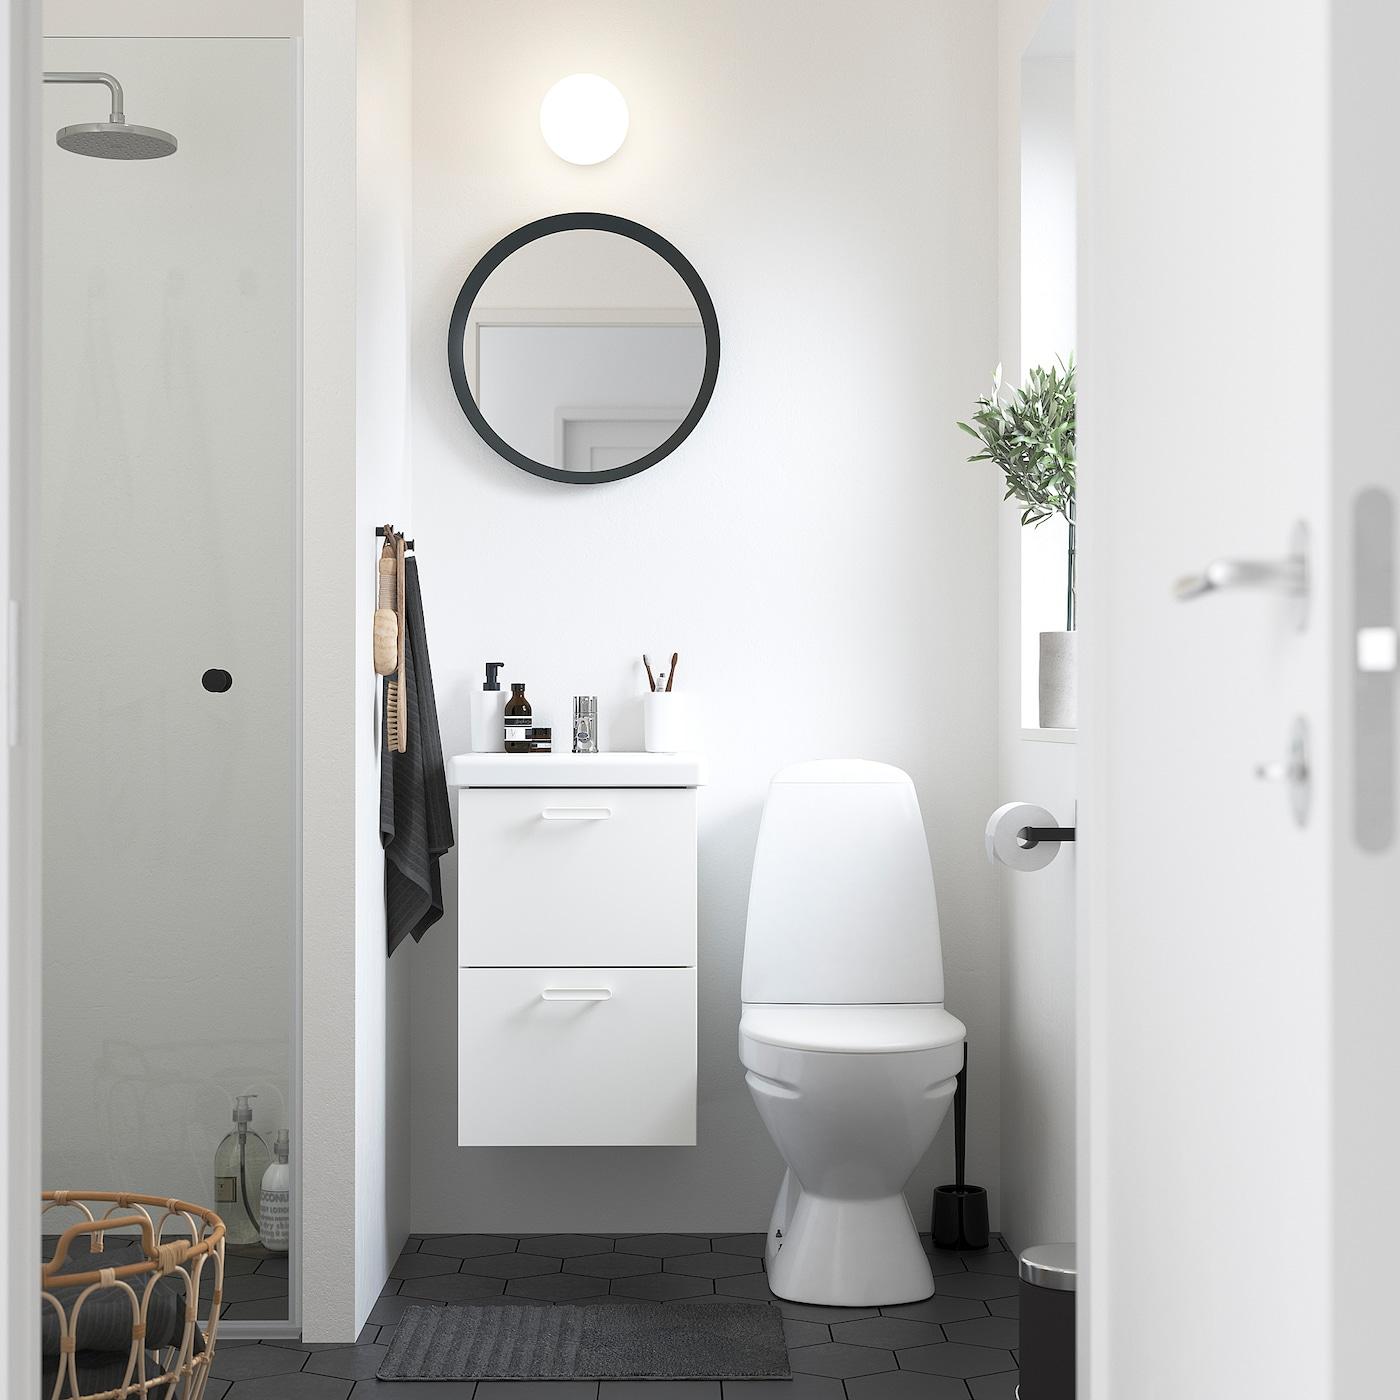 ENHET / TVÄLLEN Skab til vask med 2 skuffer, hvid/PILKÅN blandingsbatteri, 44x43x65 cm